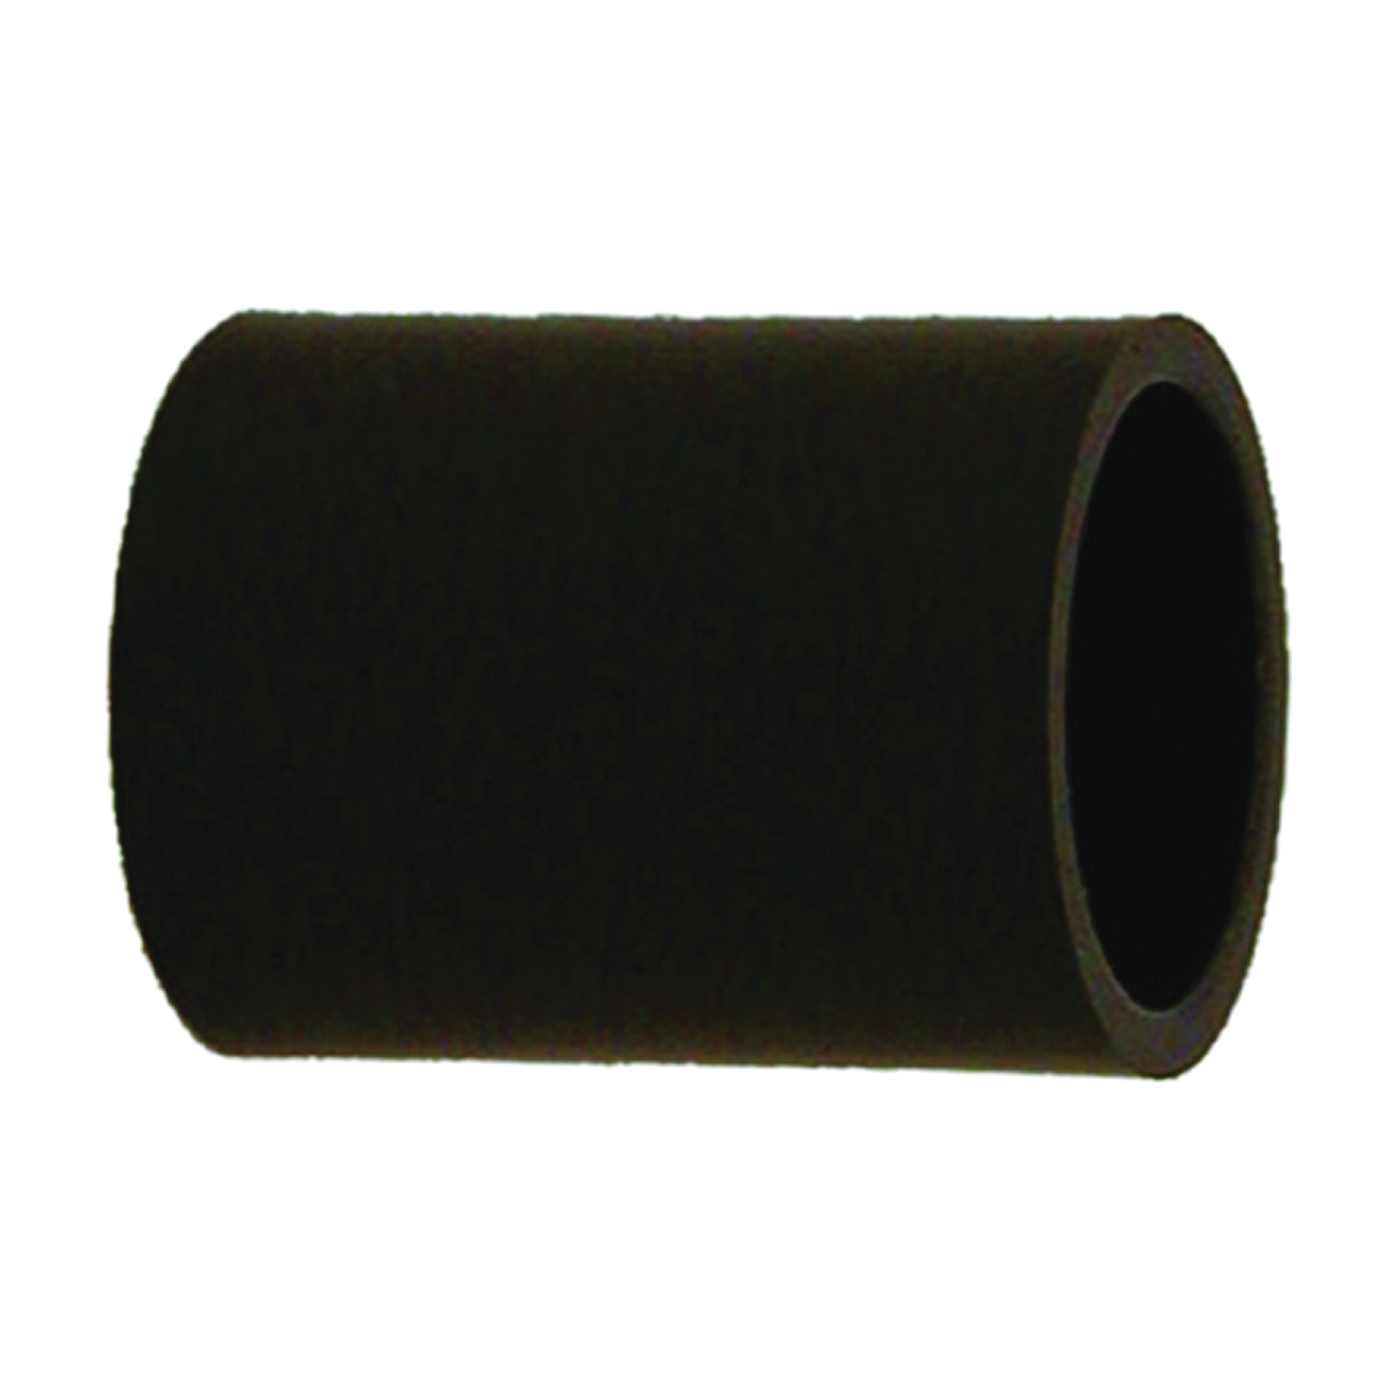 Picture of GENOVA 300 Series 301078 Pipe Coupler, 3/4 in, Slip Joint, Gray, SCH 80 Schedule, 690 psi Pressure